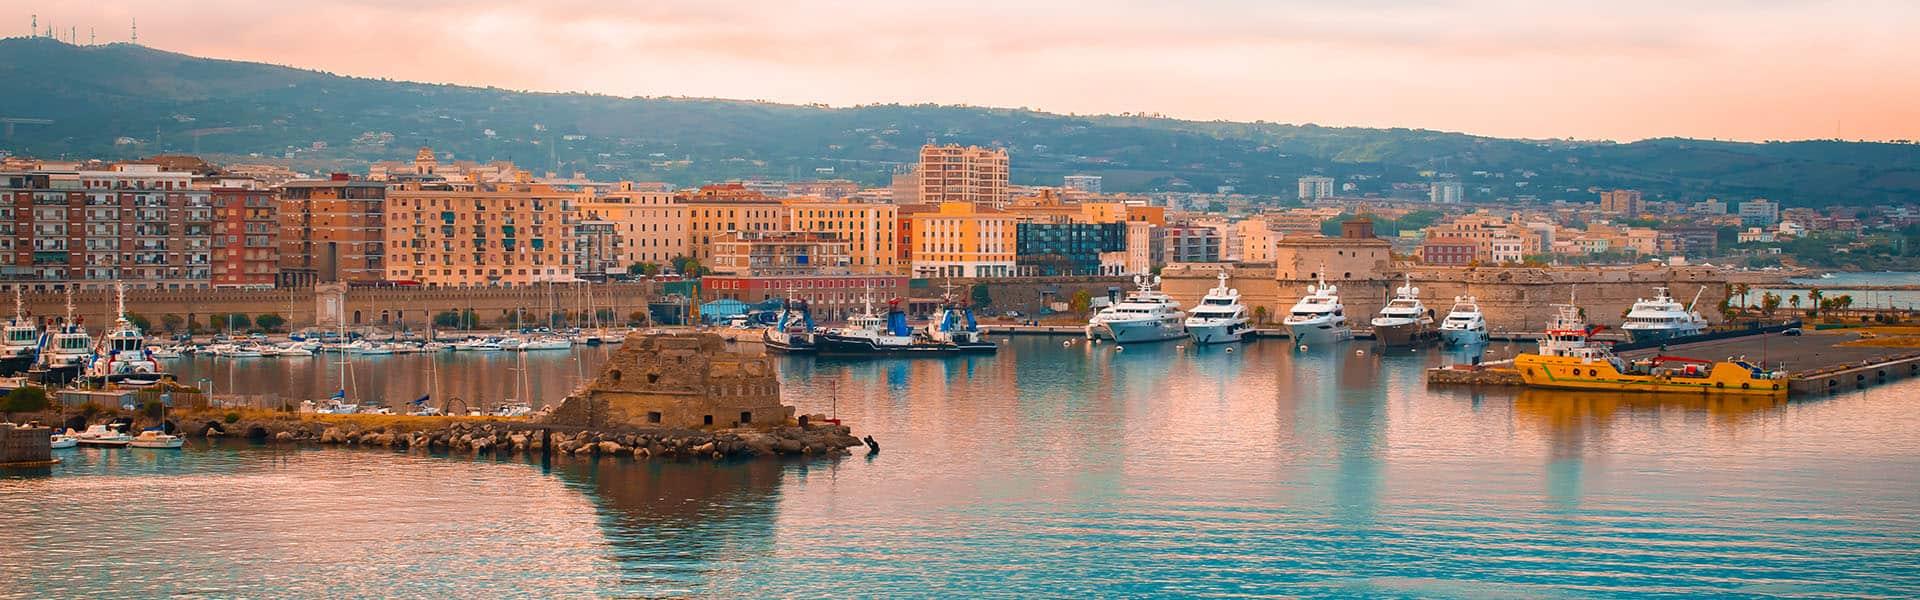 Îles grecques : Italie, Croatie et Turquie